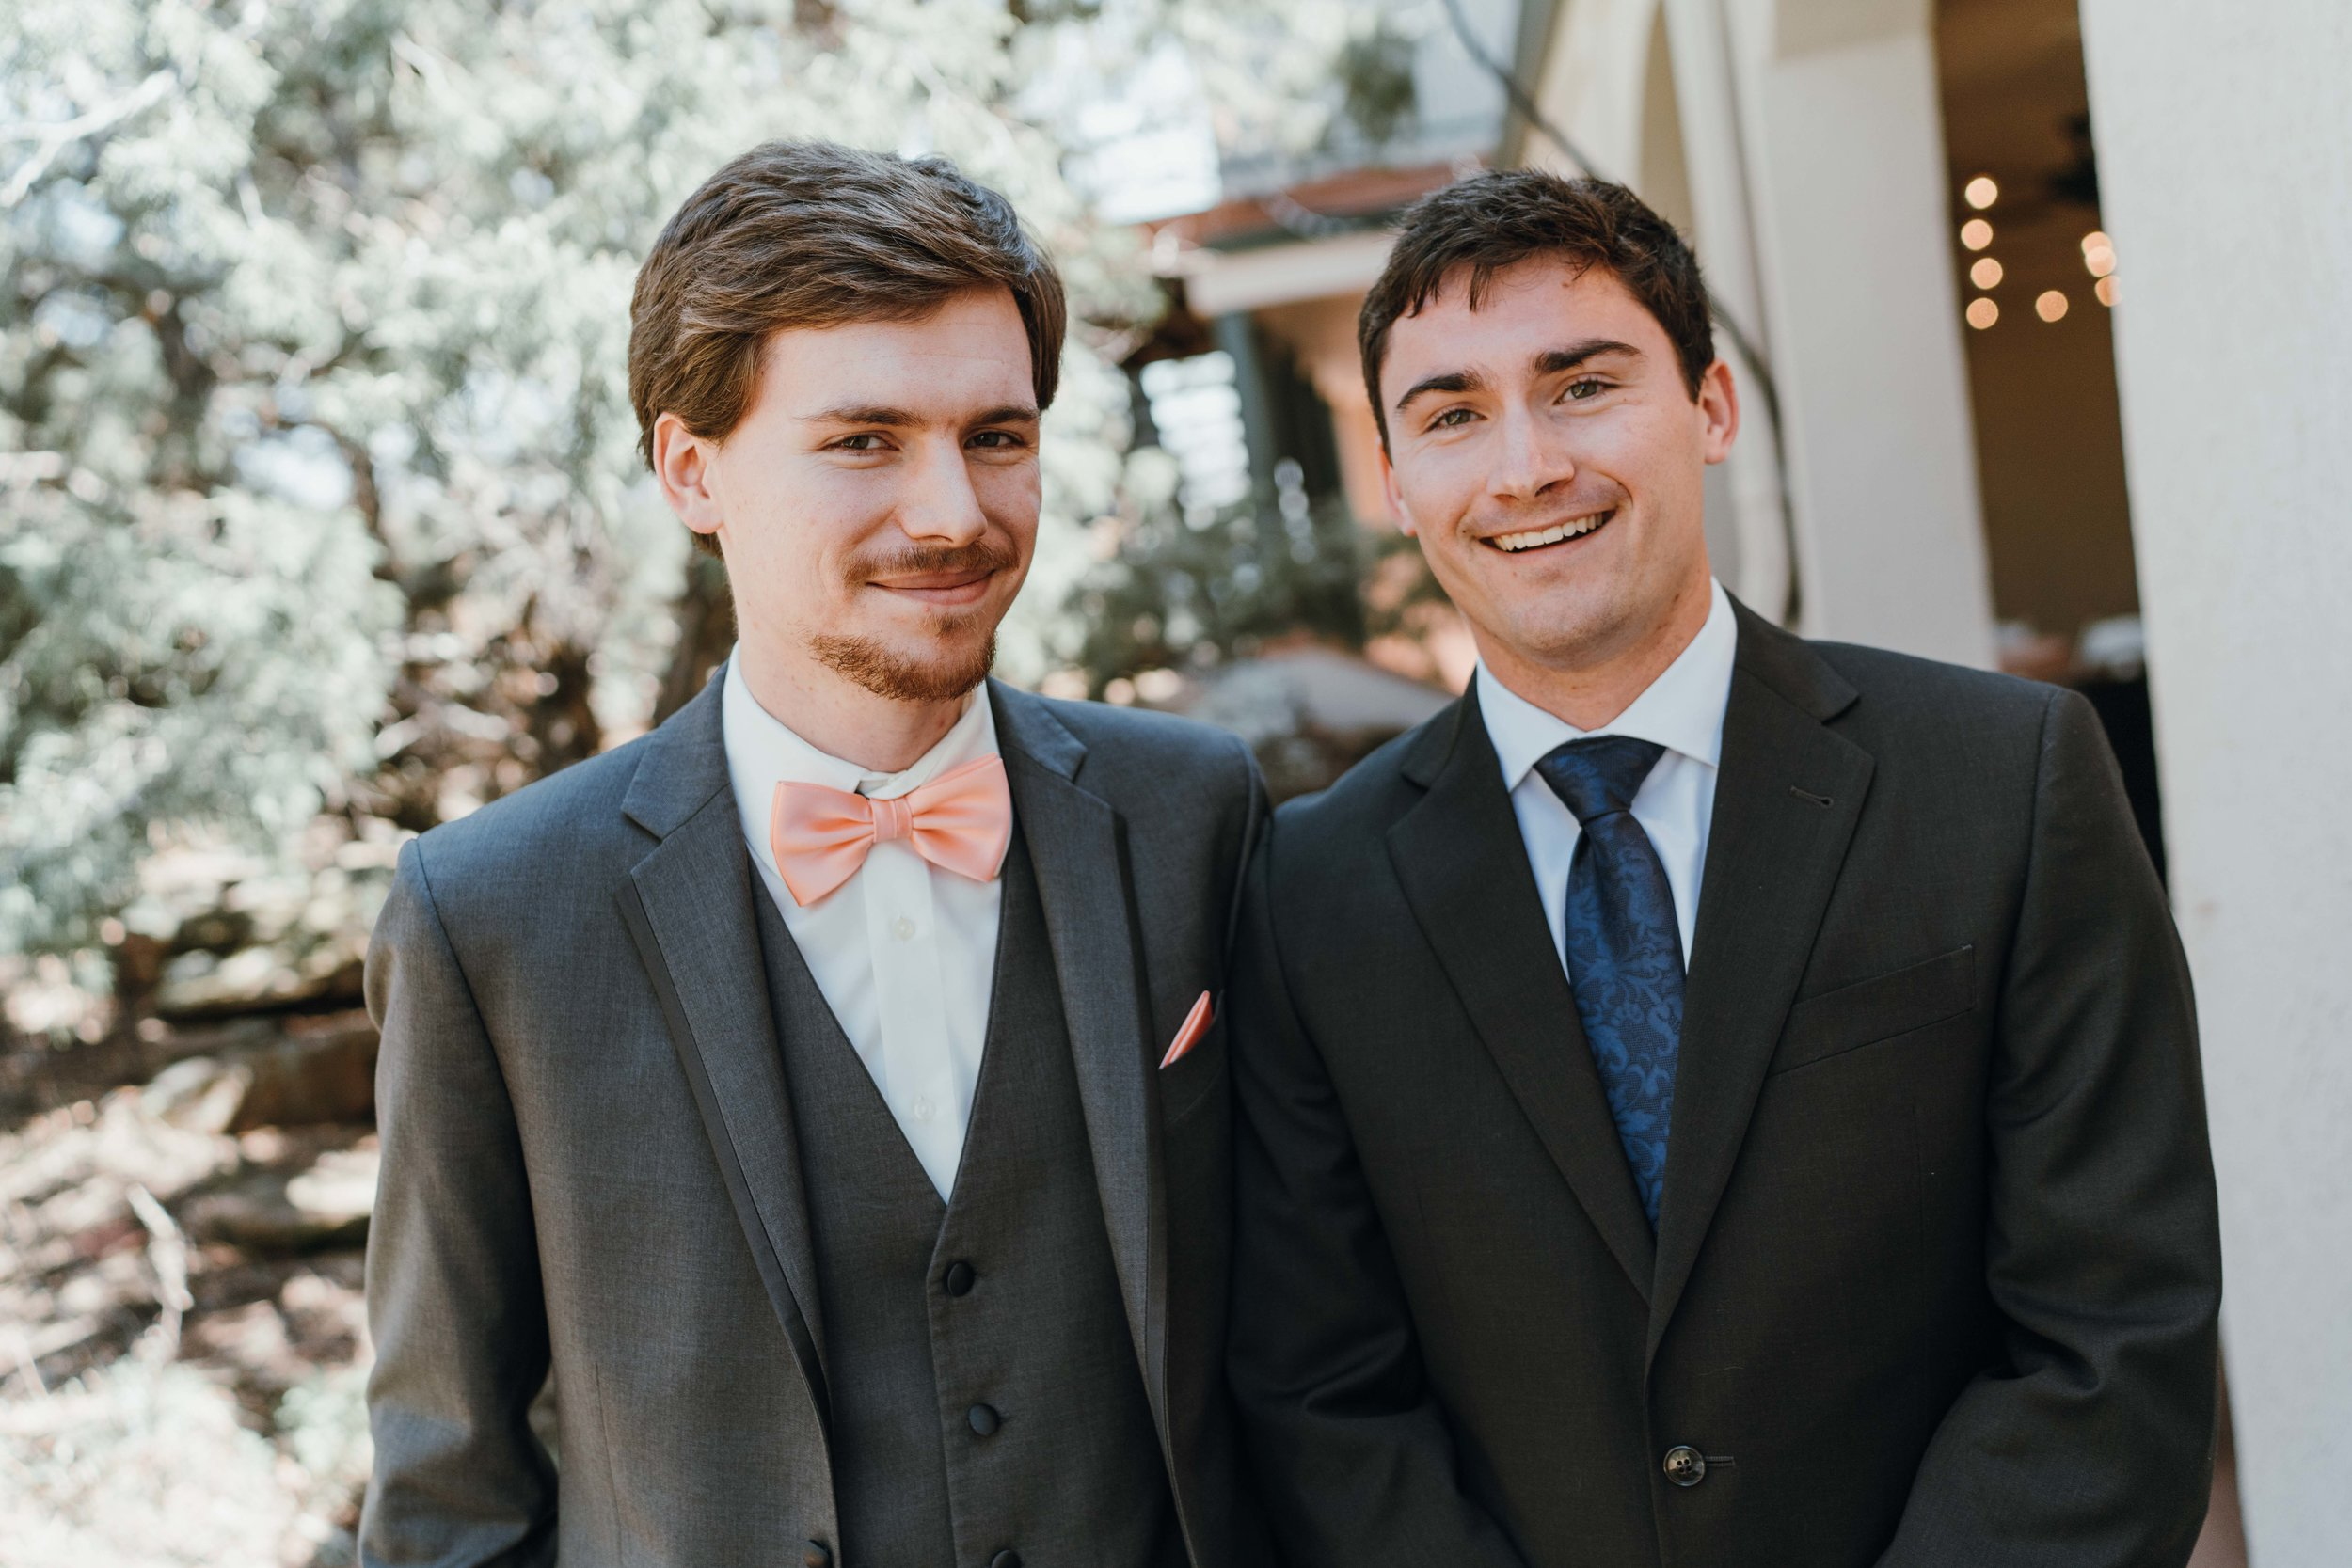 denver wedding photographer lioncrest manor in lyons ben and mali -DSC05920.jpg